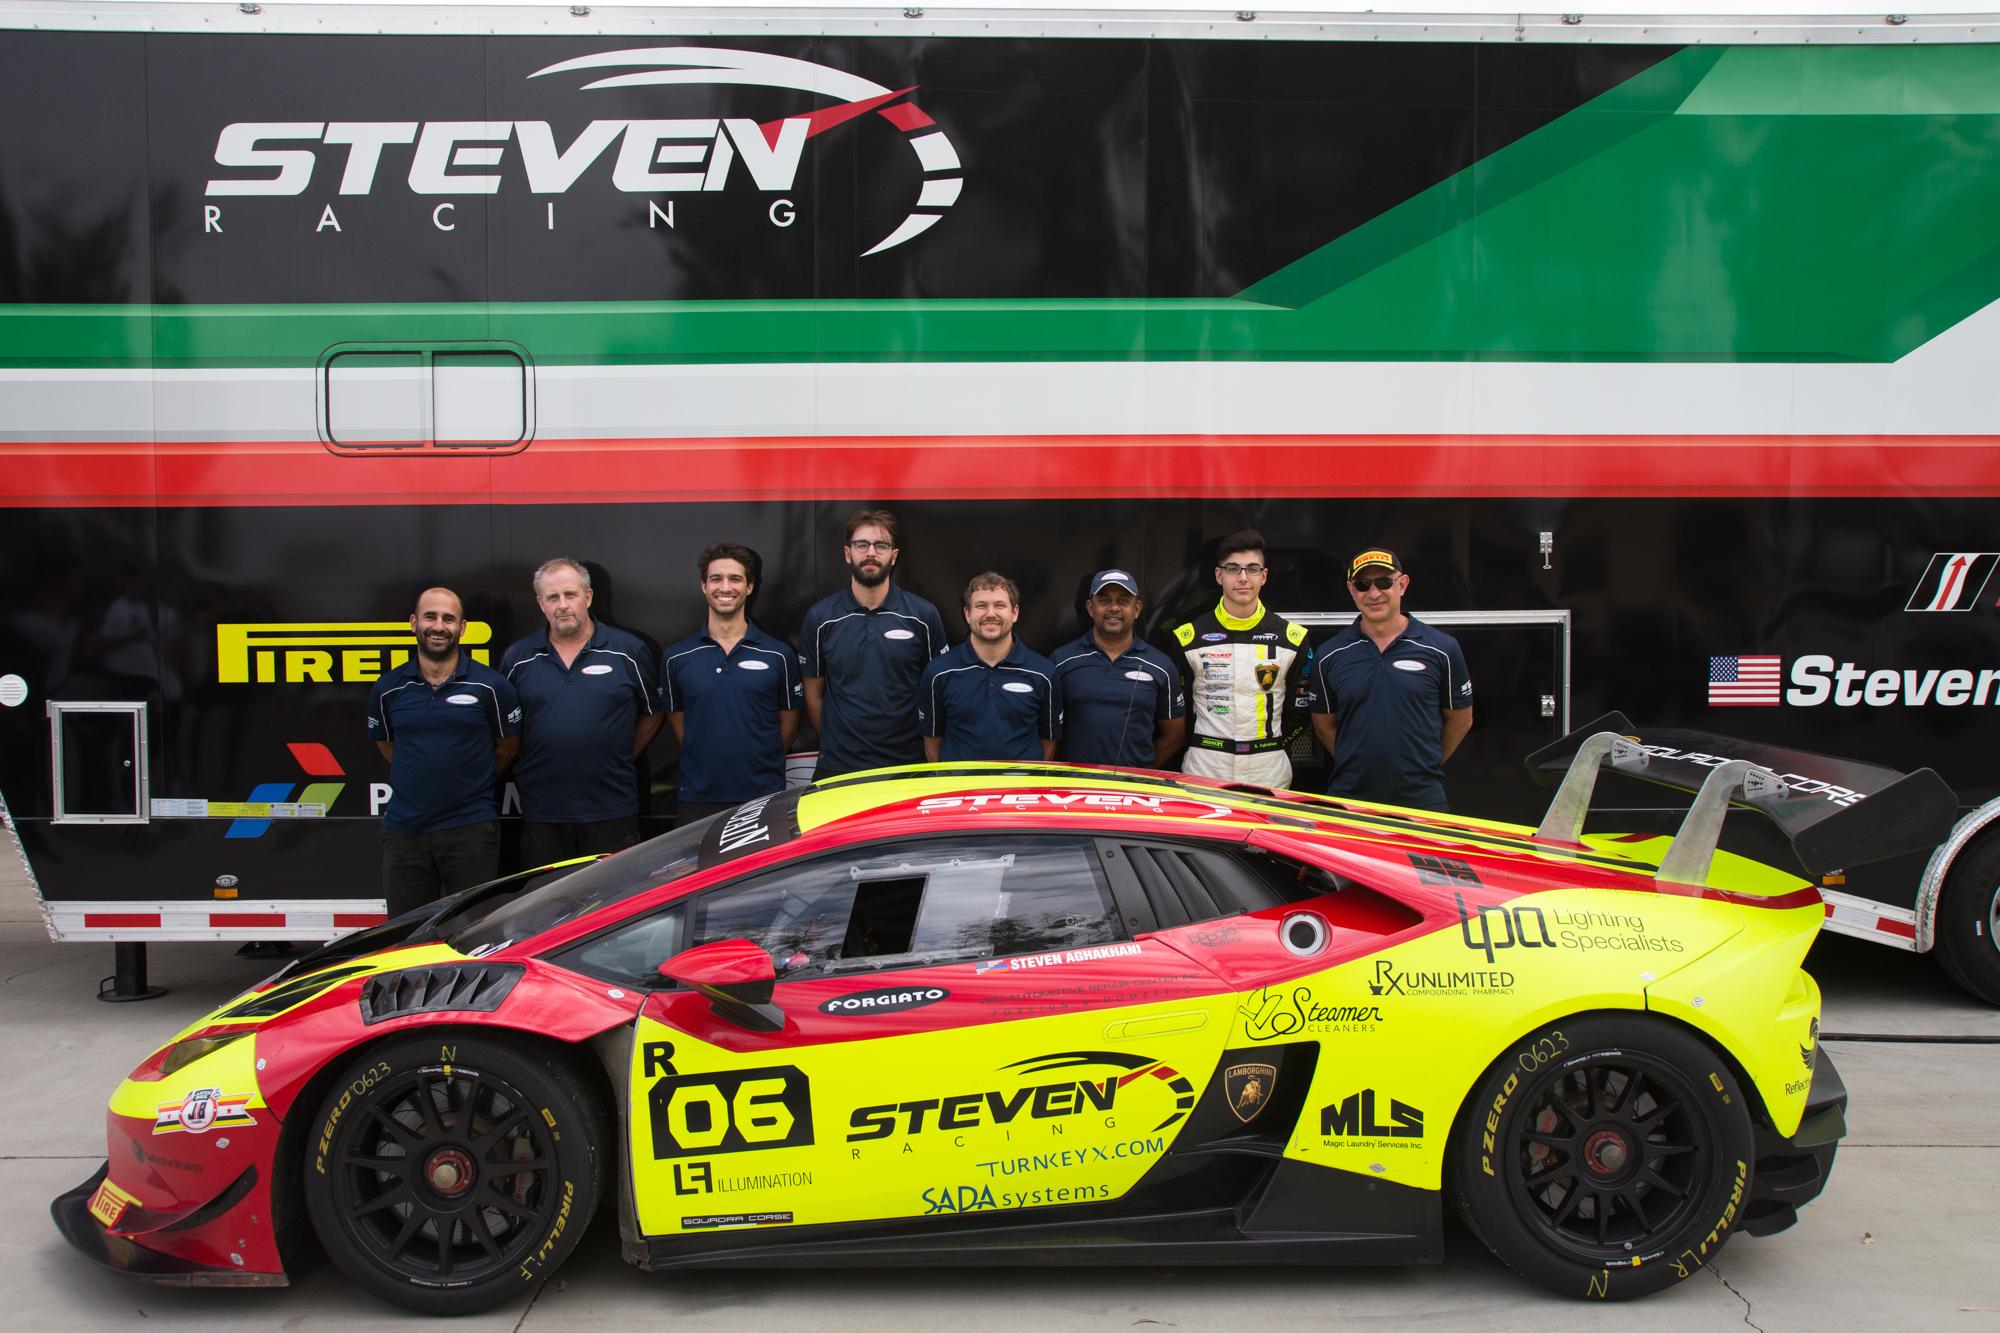 Steven-Racing-20171029-55267.jpg